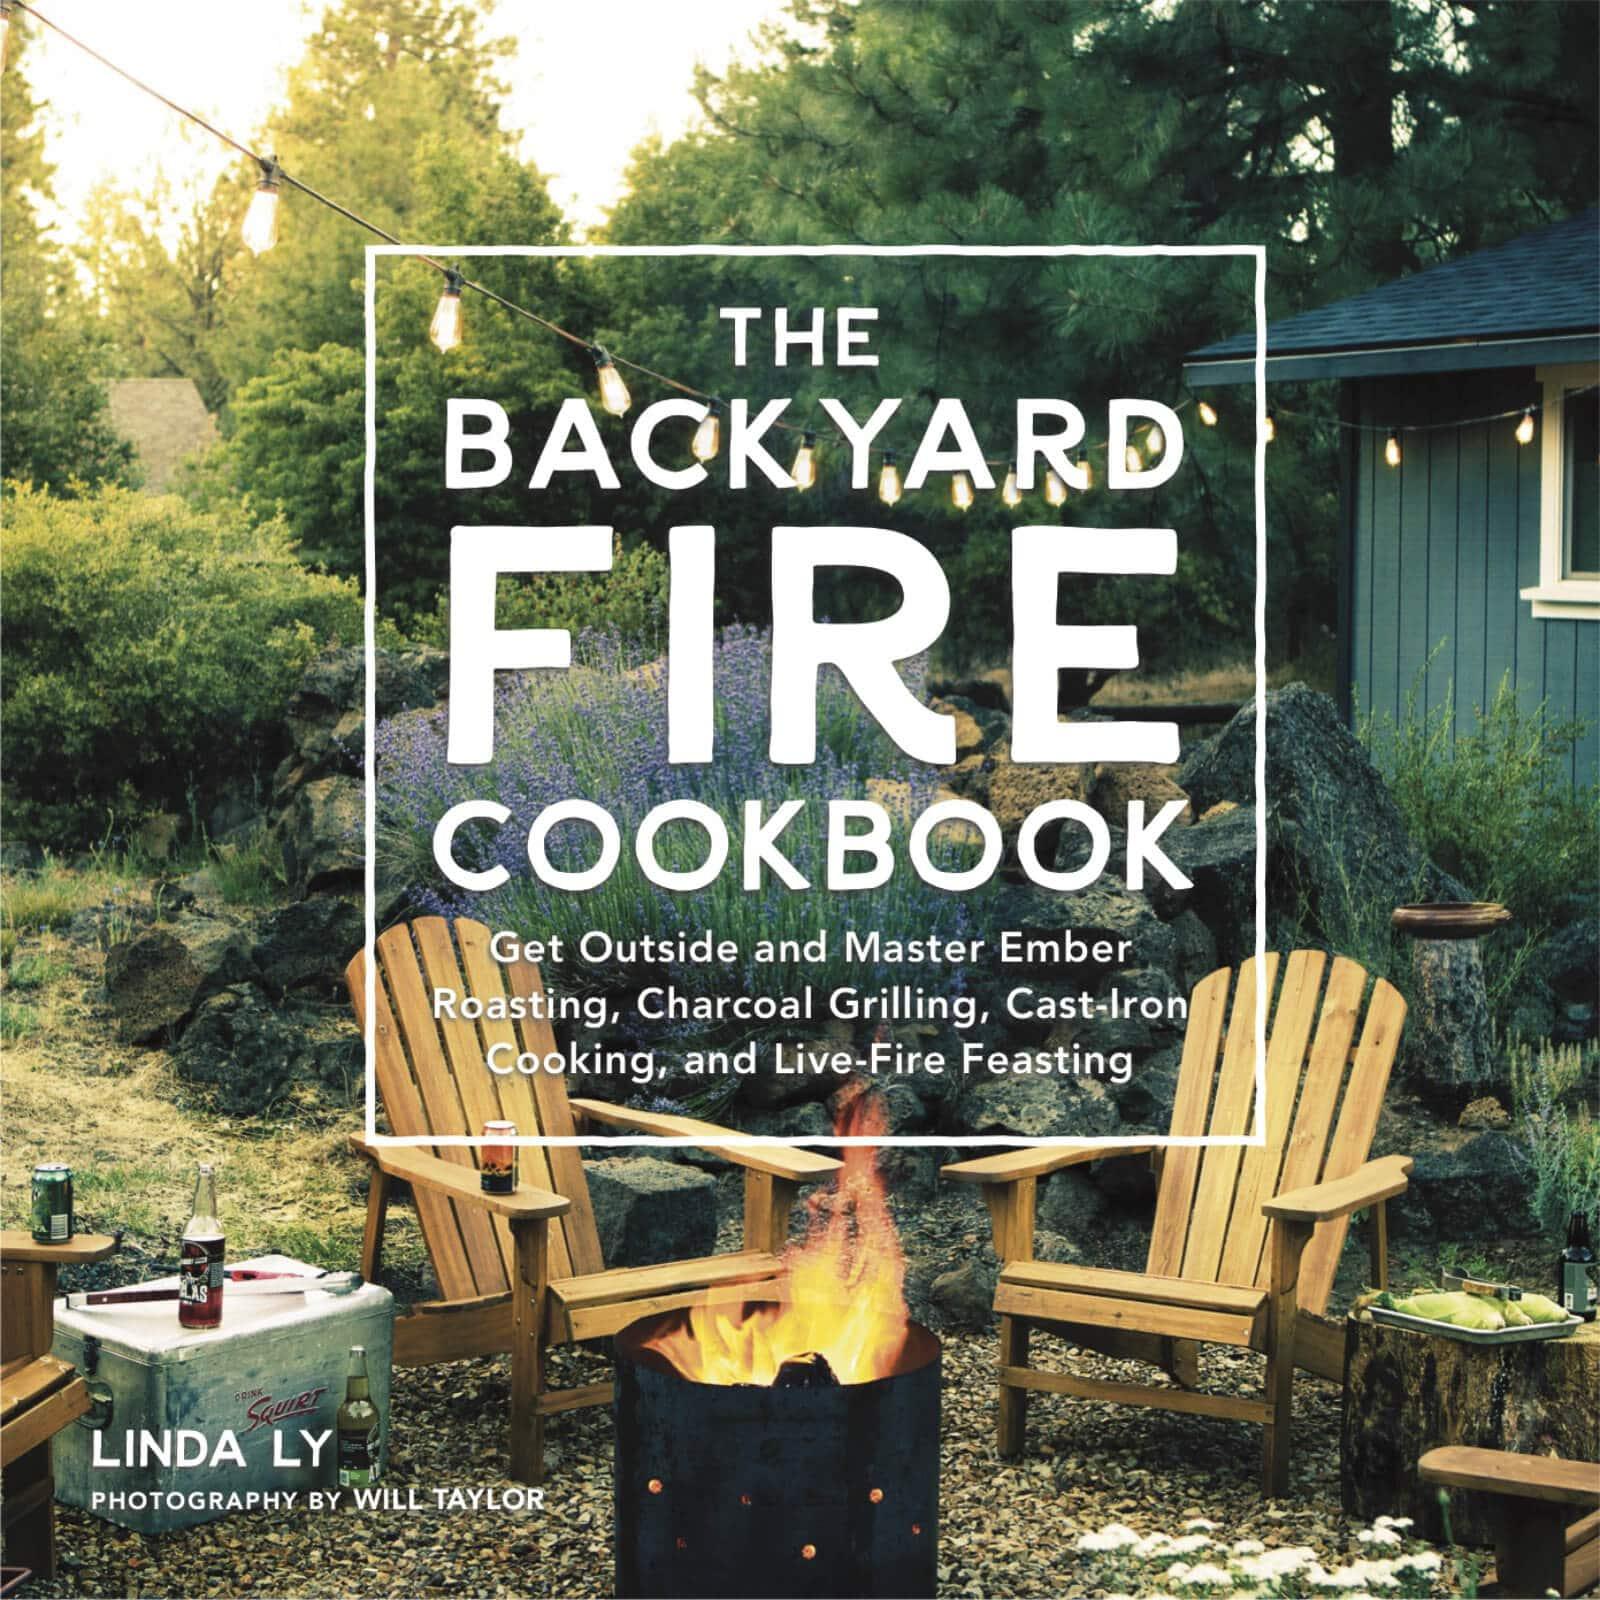 A sneek peek of The Backyard Fire Cookbook